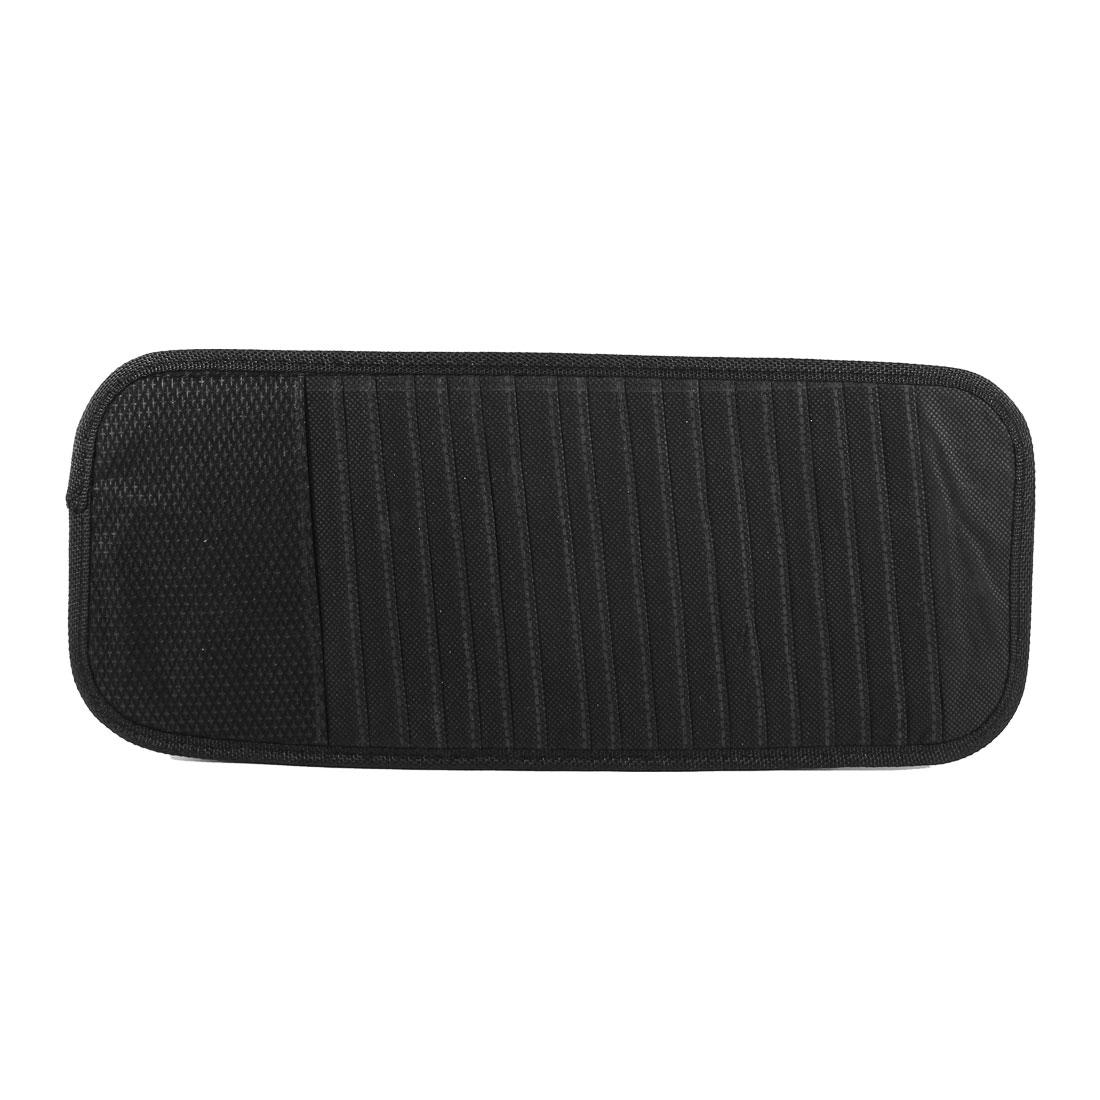 Car Nylon Non Woven Visor 18 Capacity CD Discs Organizer Bag Holder Black